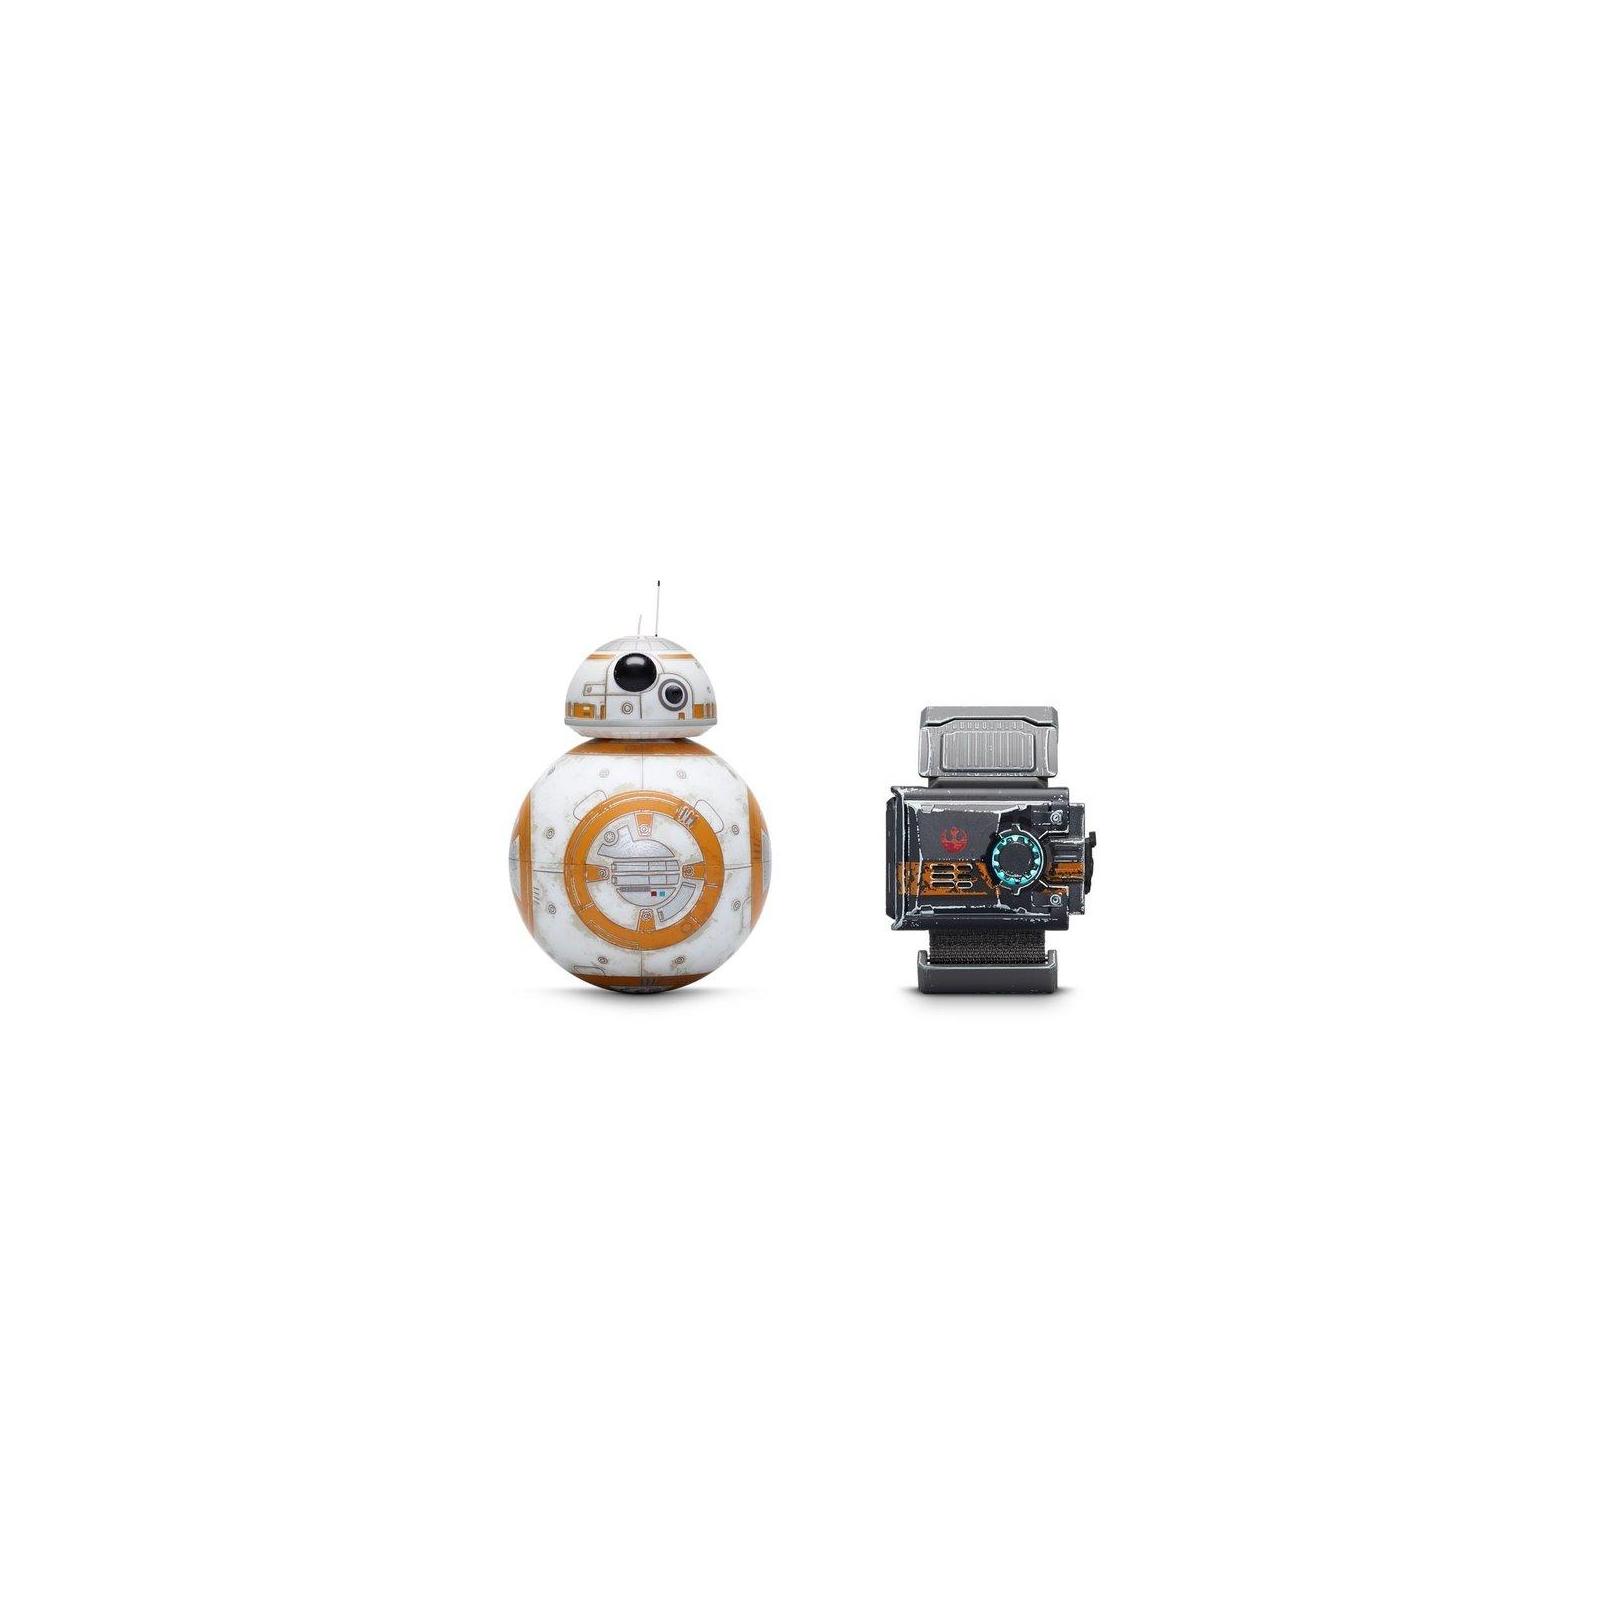 Робот Sphero BB-8 Special Edition with Force Band (322384) изображение 8